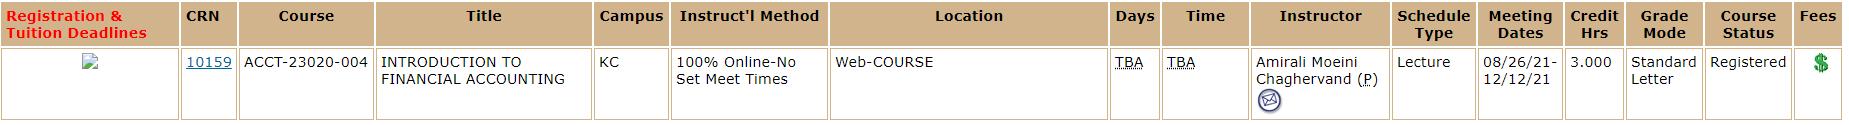 100% Online-No Set Meet Times Course sample